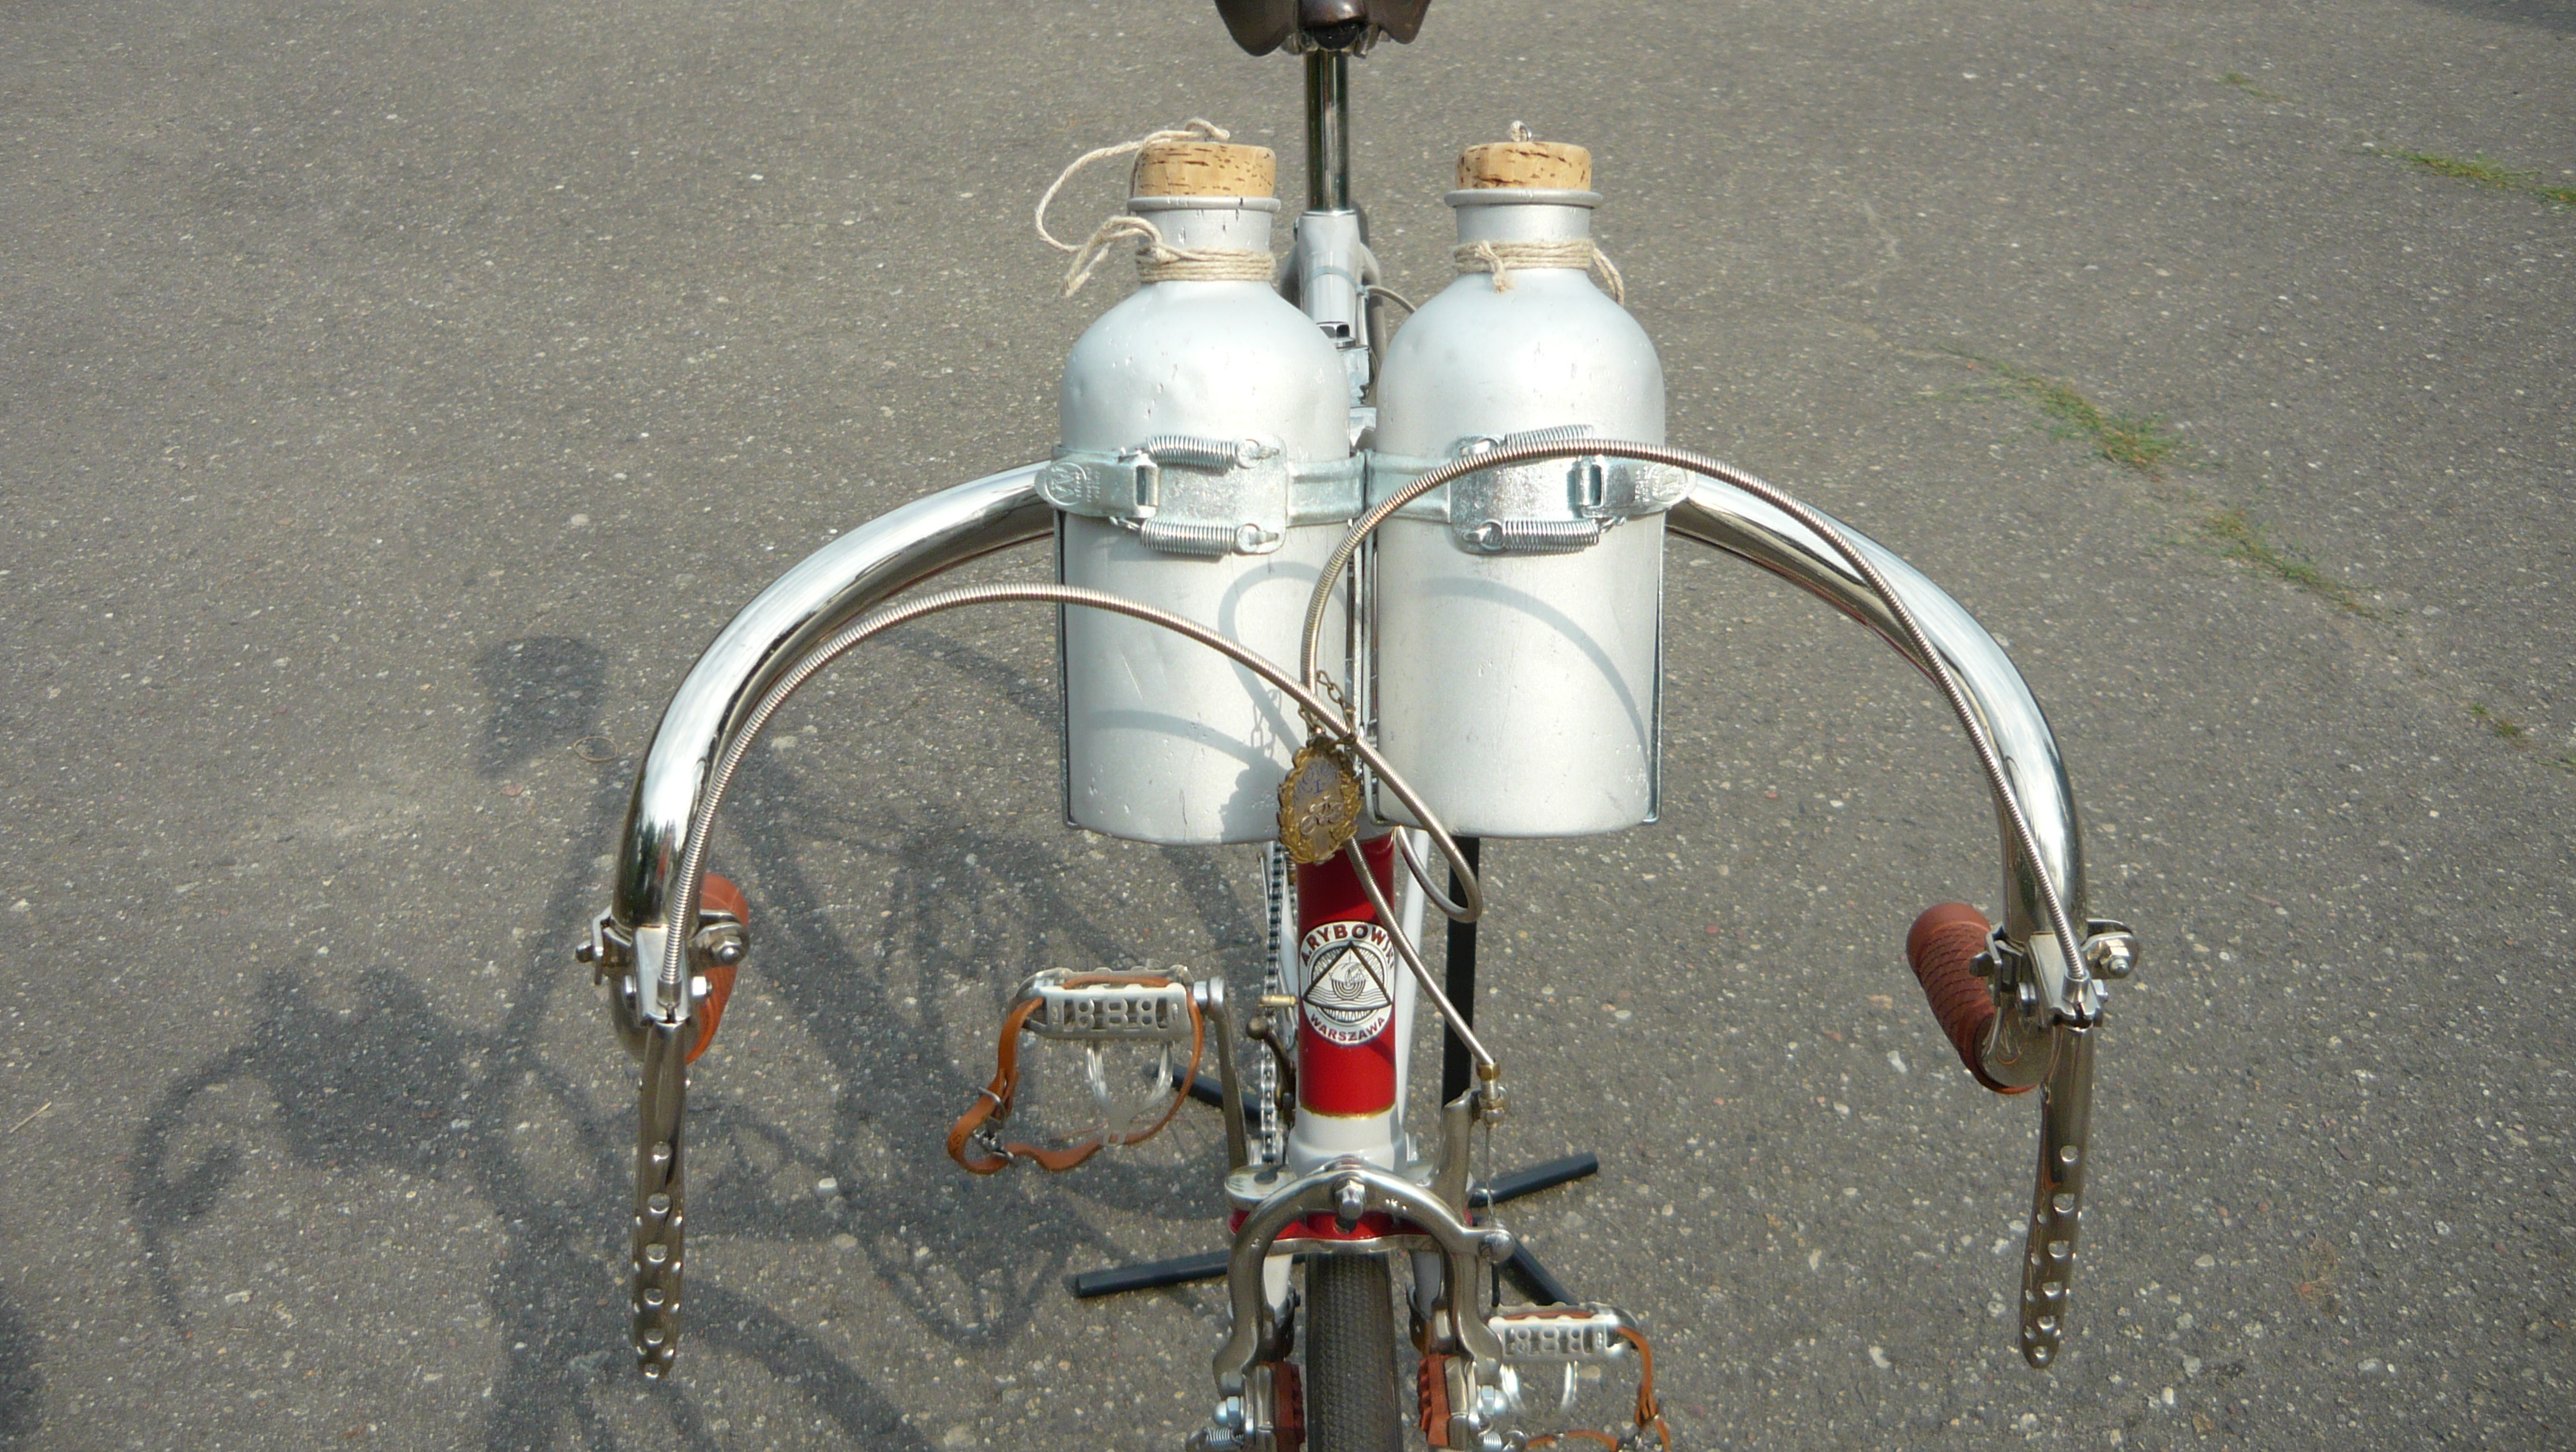 Retro Bike Poznan P1160518